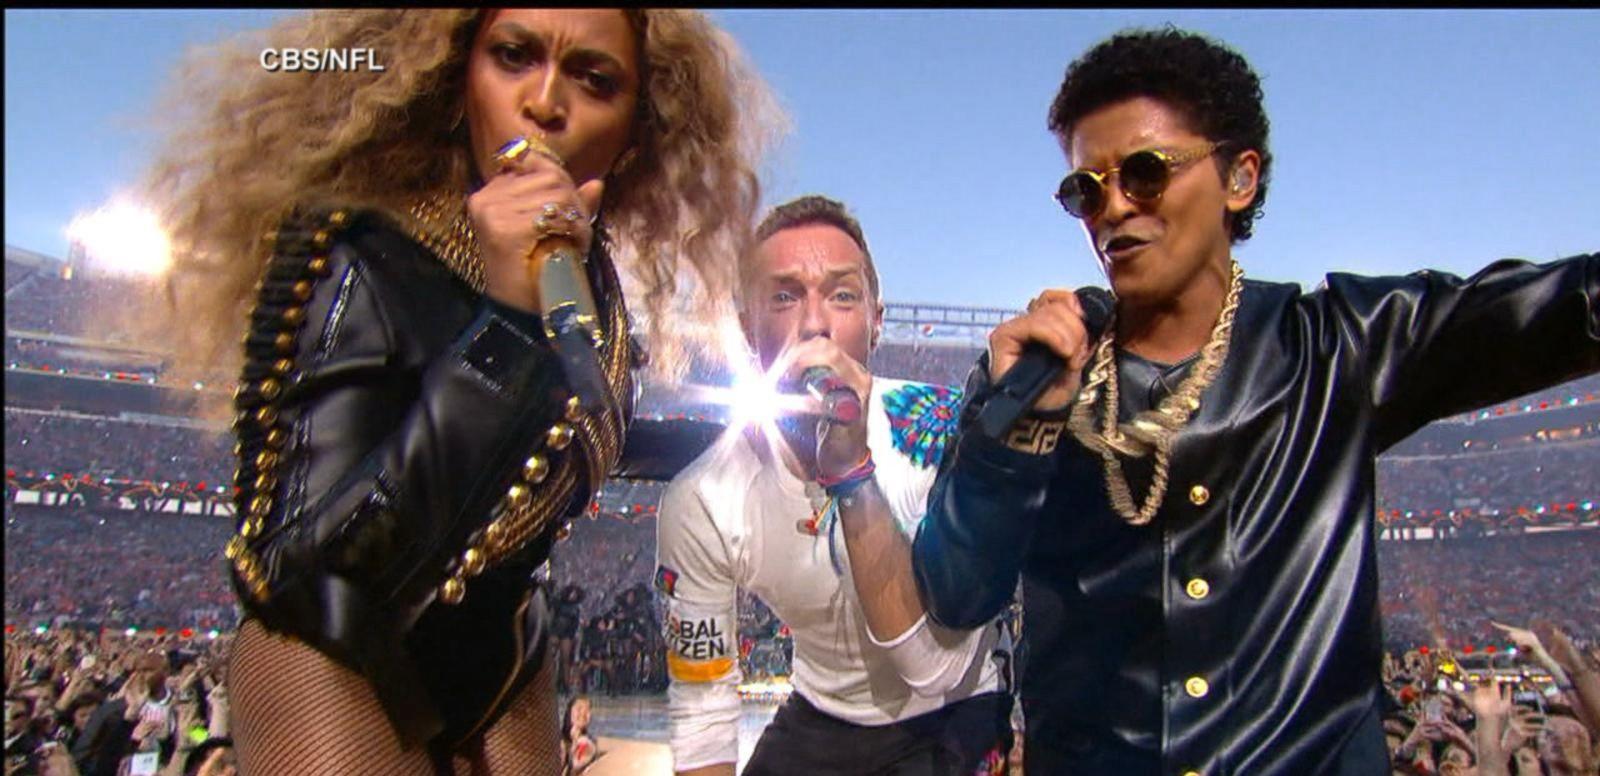 VIDEO: Beyonce, Coldplay, Bruno Mars Rock Super Bowl 50 Halftime Show